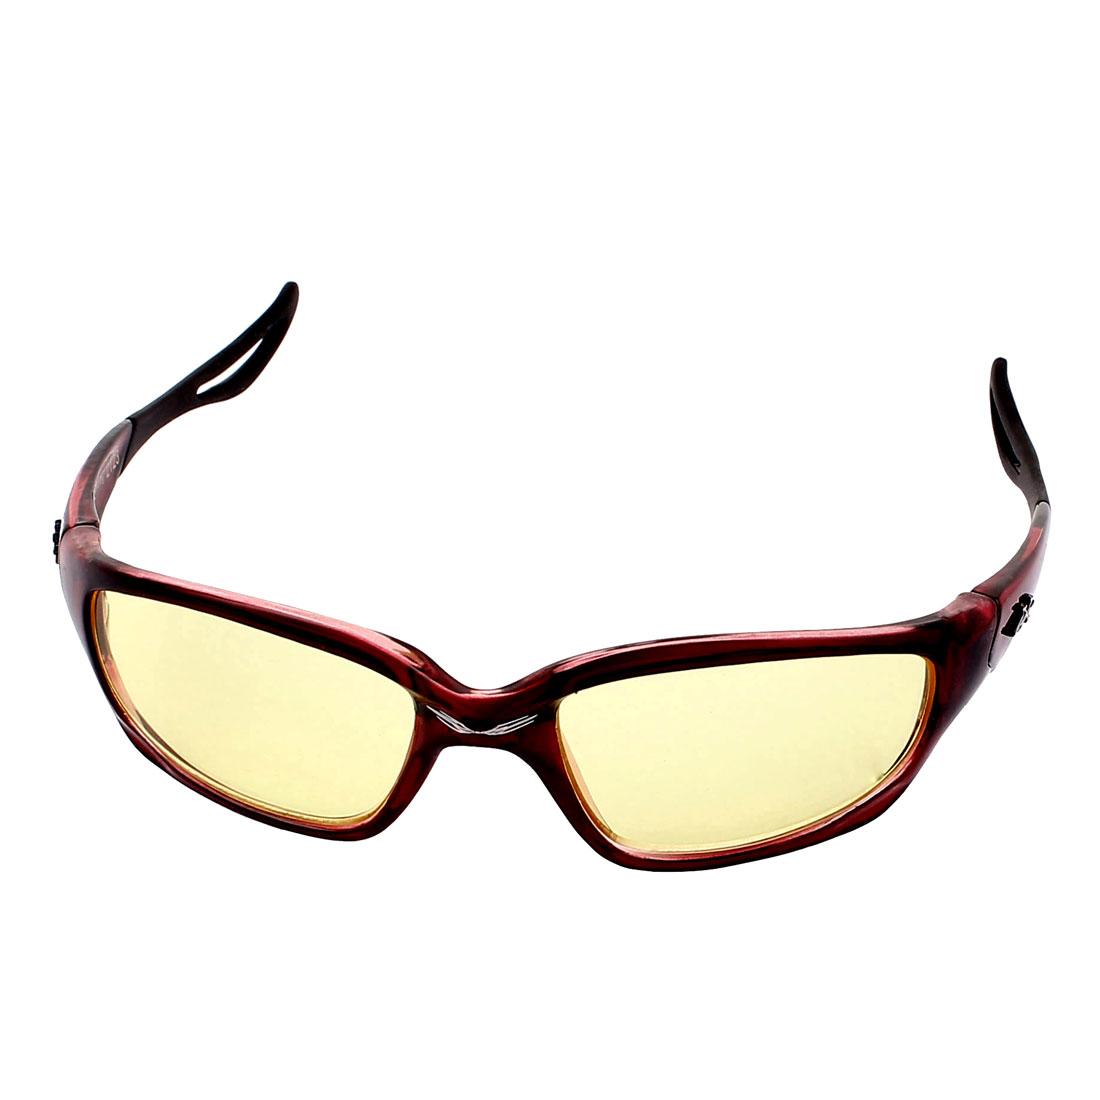 Mens Outdoor Sunglasses Driving Eyeglasses Sports Eyewear Glasses